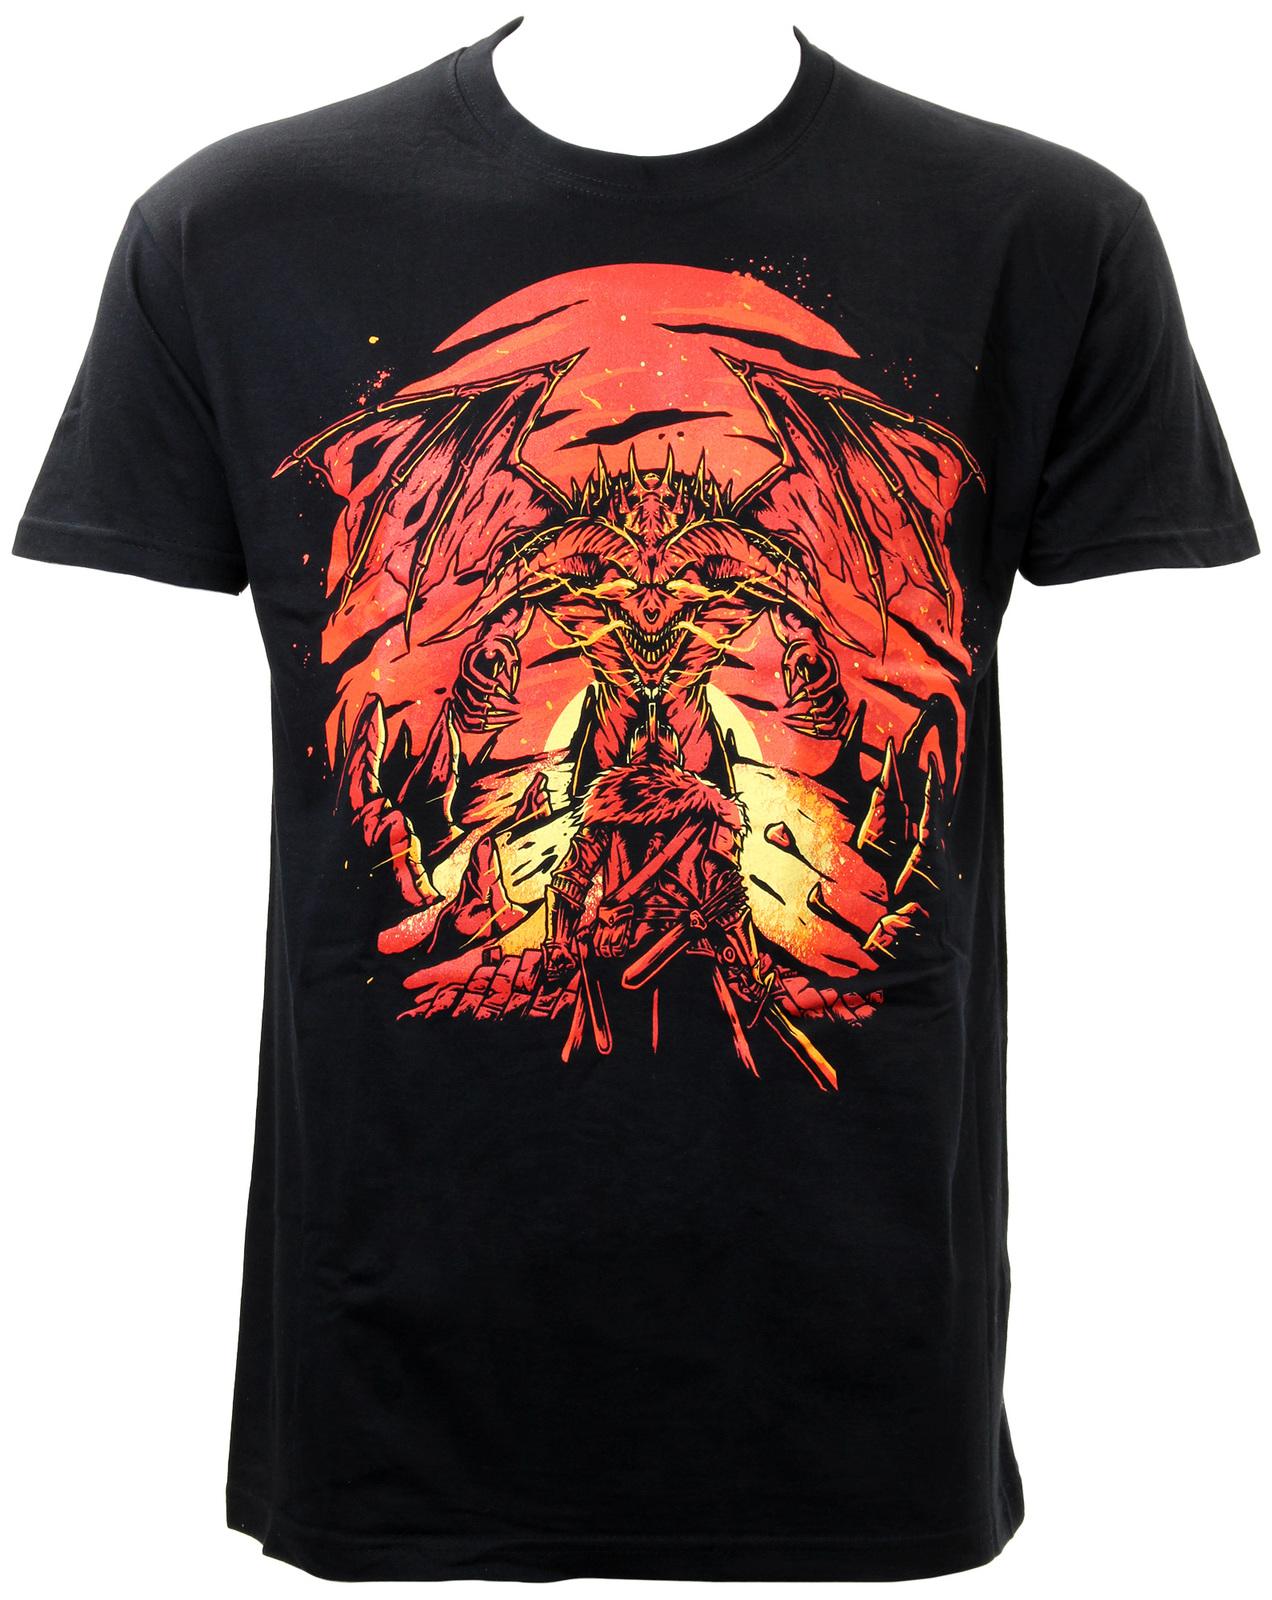 Dark Souls 3 Dragon T-Shirt (XX-Large) image